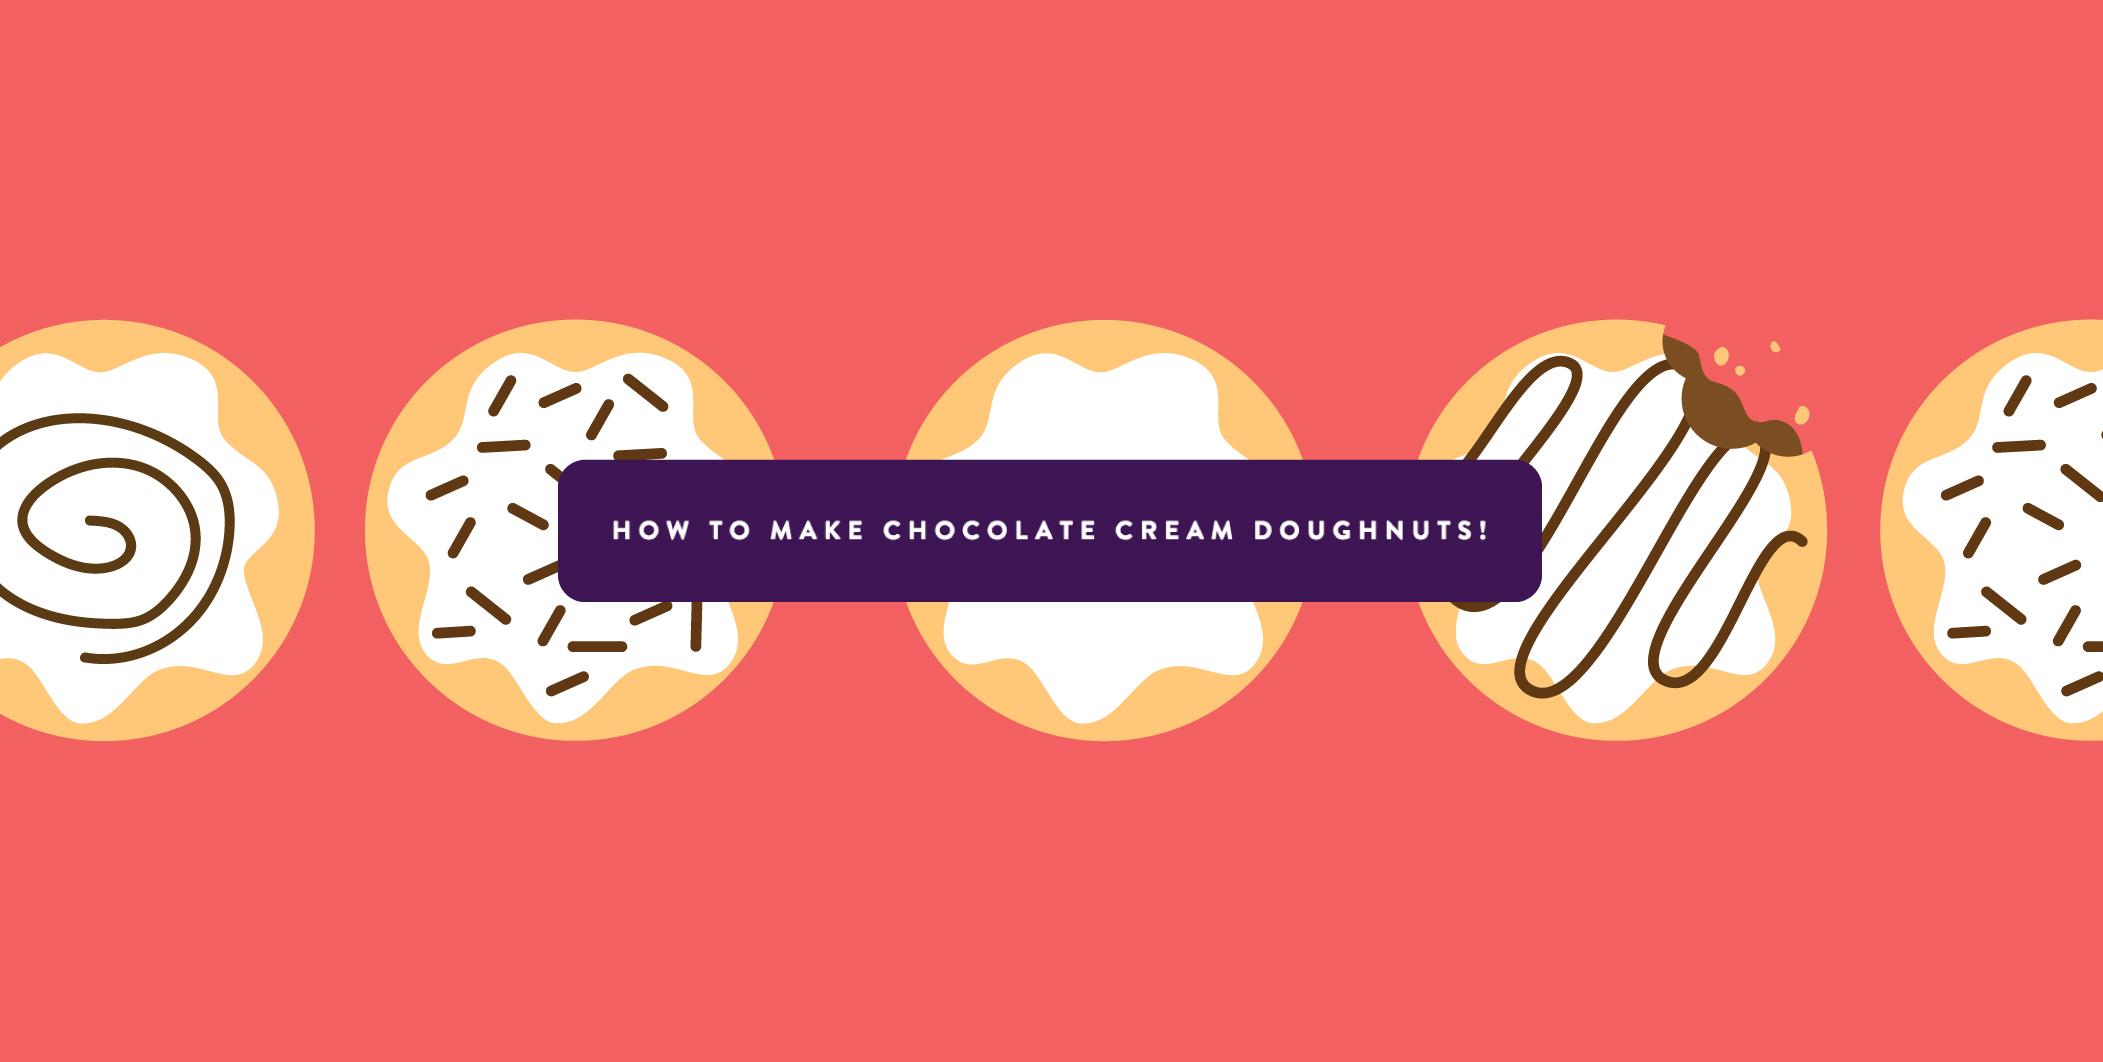 chocolatecreamdoughnuts.jpg